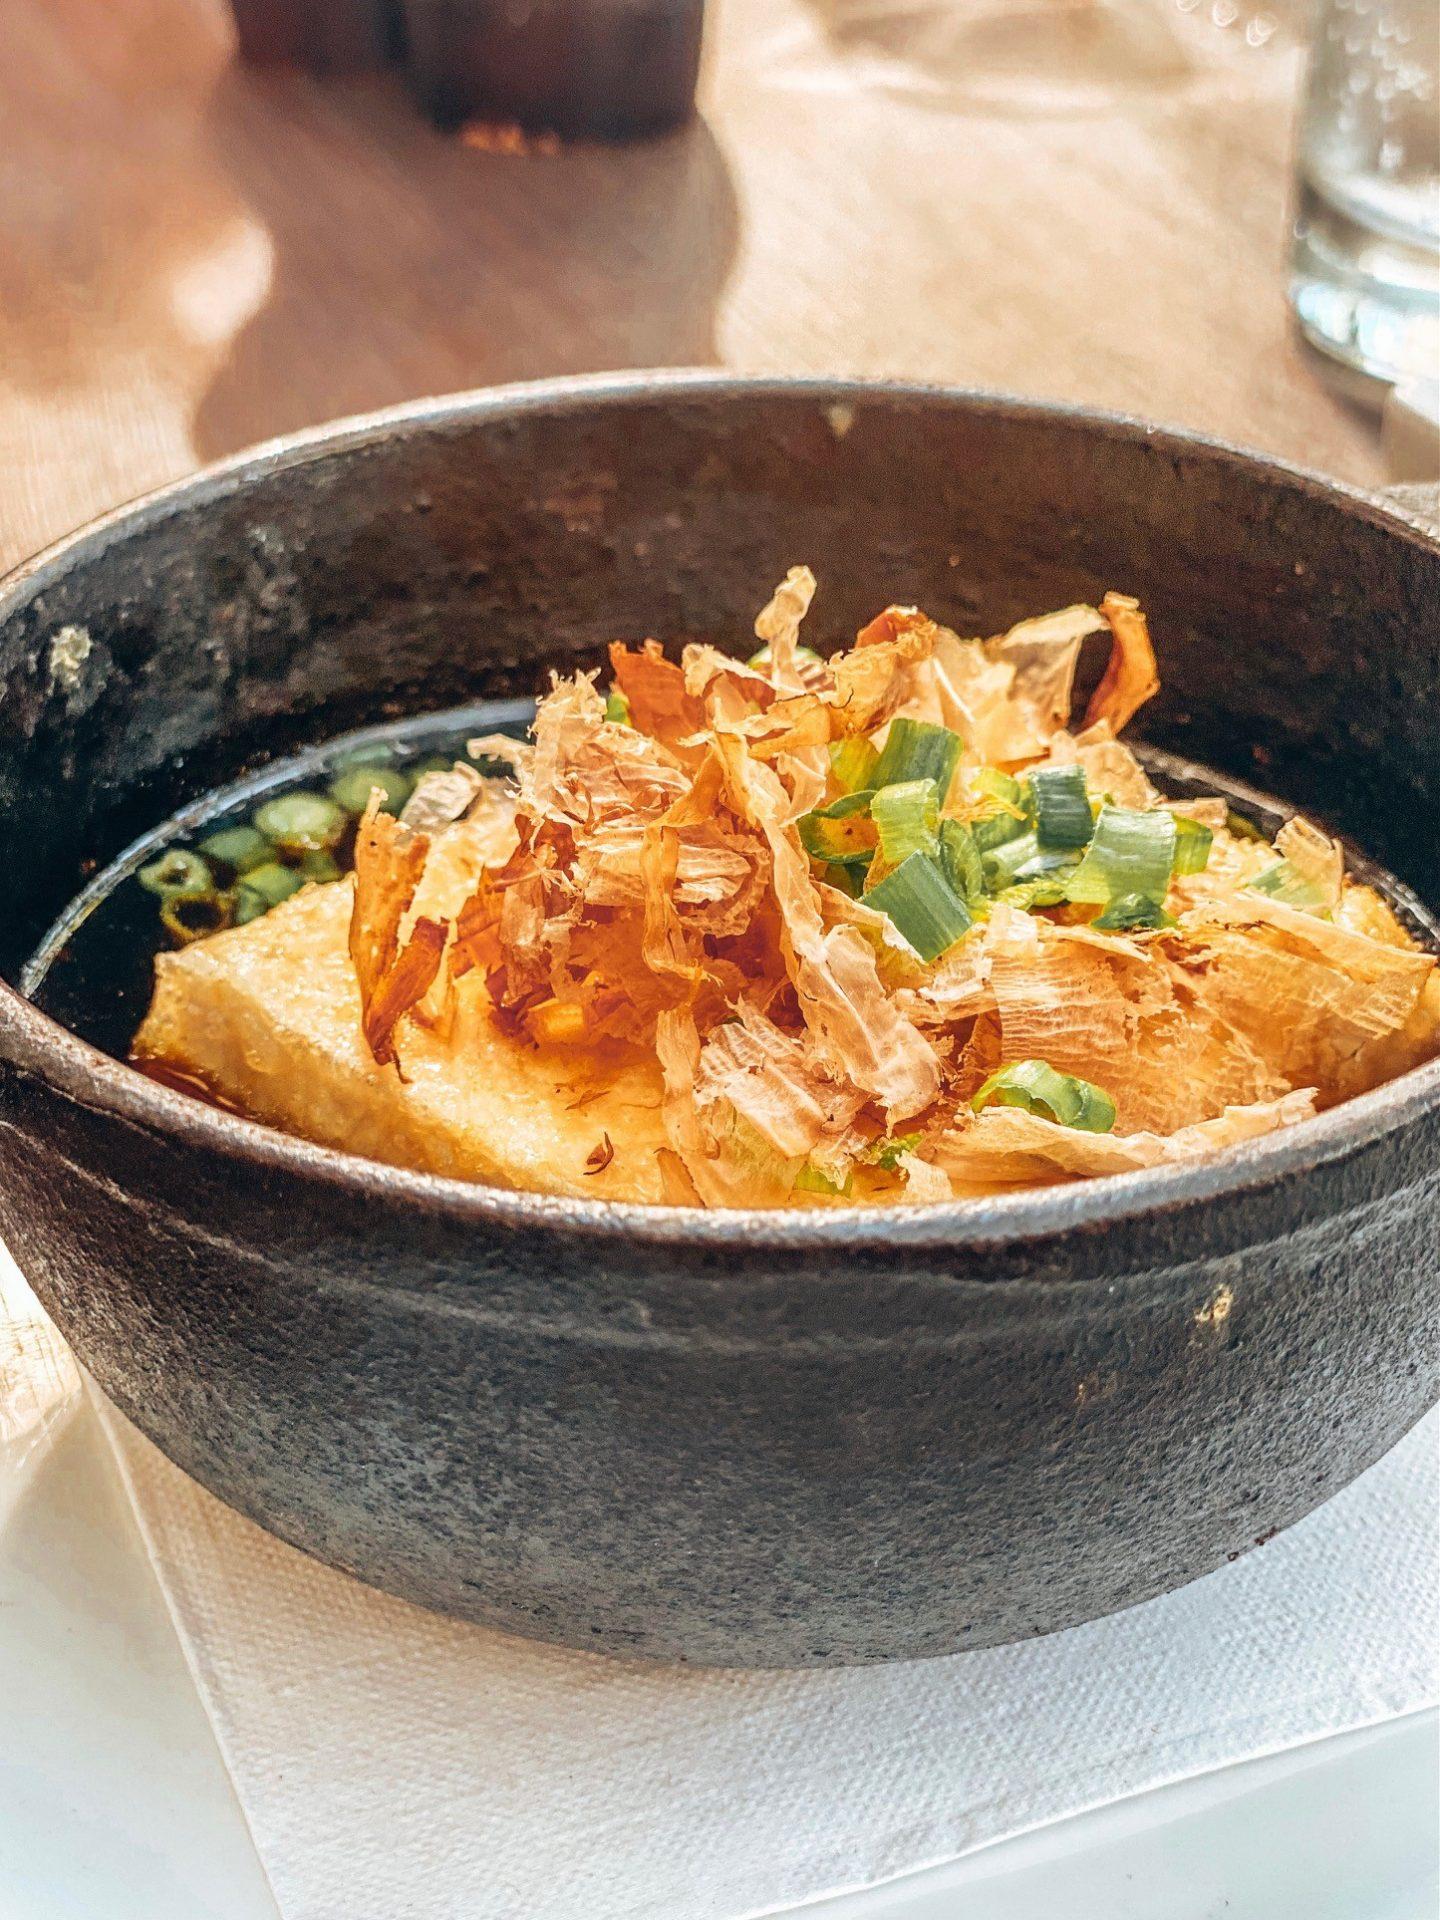 CocoMaya - Agedashi Tofu, Lightly fried crispy Tofu in Dashi Broth